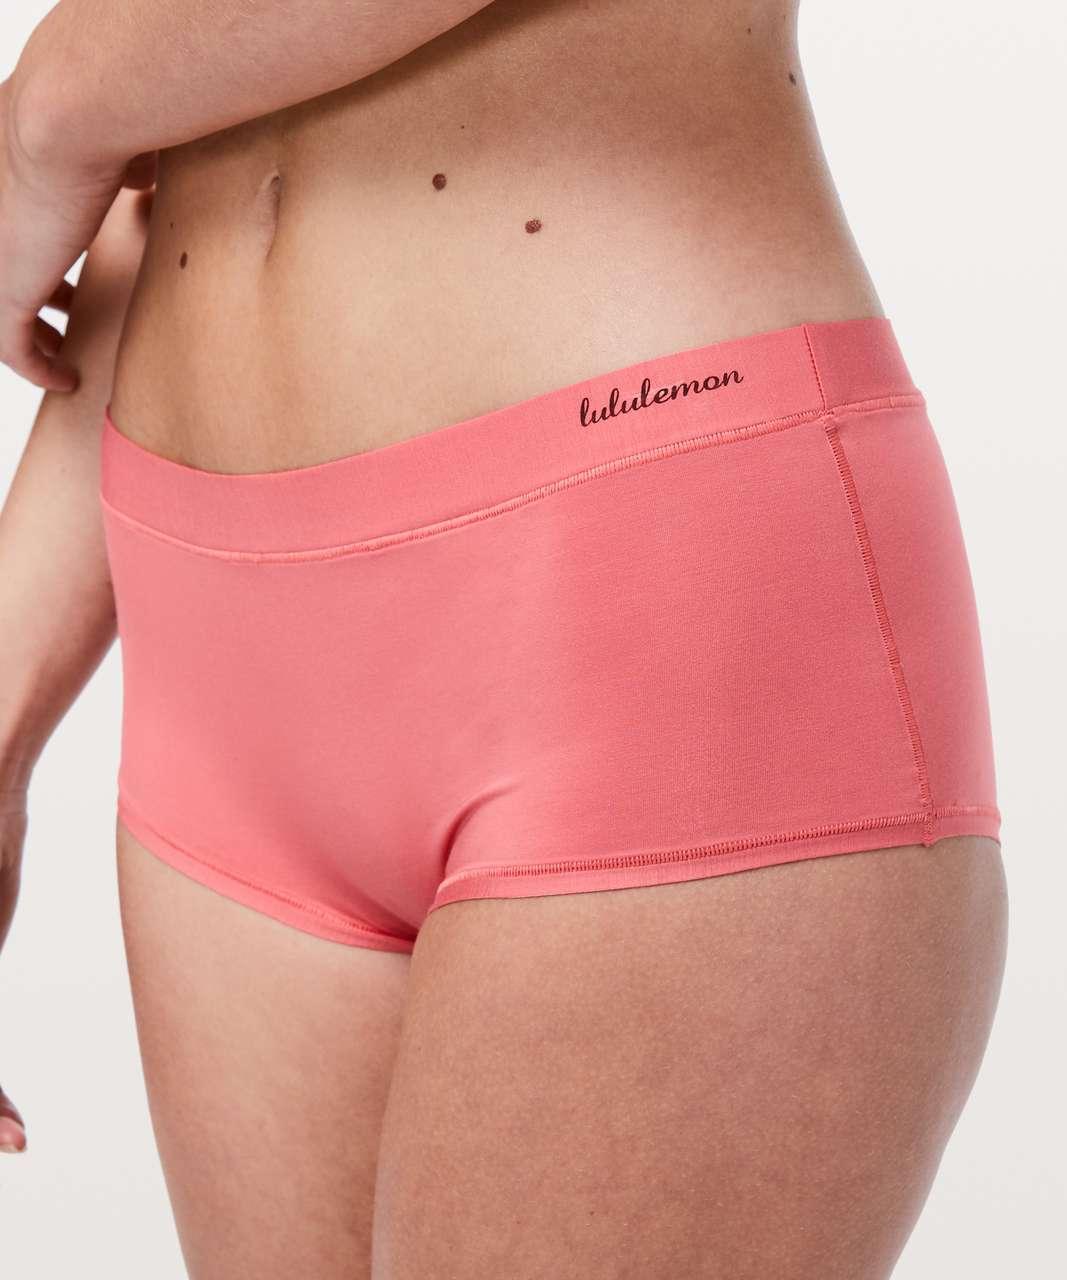 Lululemon Simply There Boyshort - Blush Coral